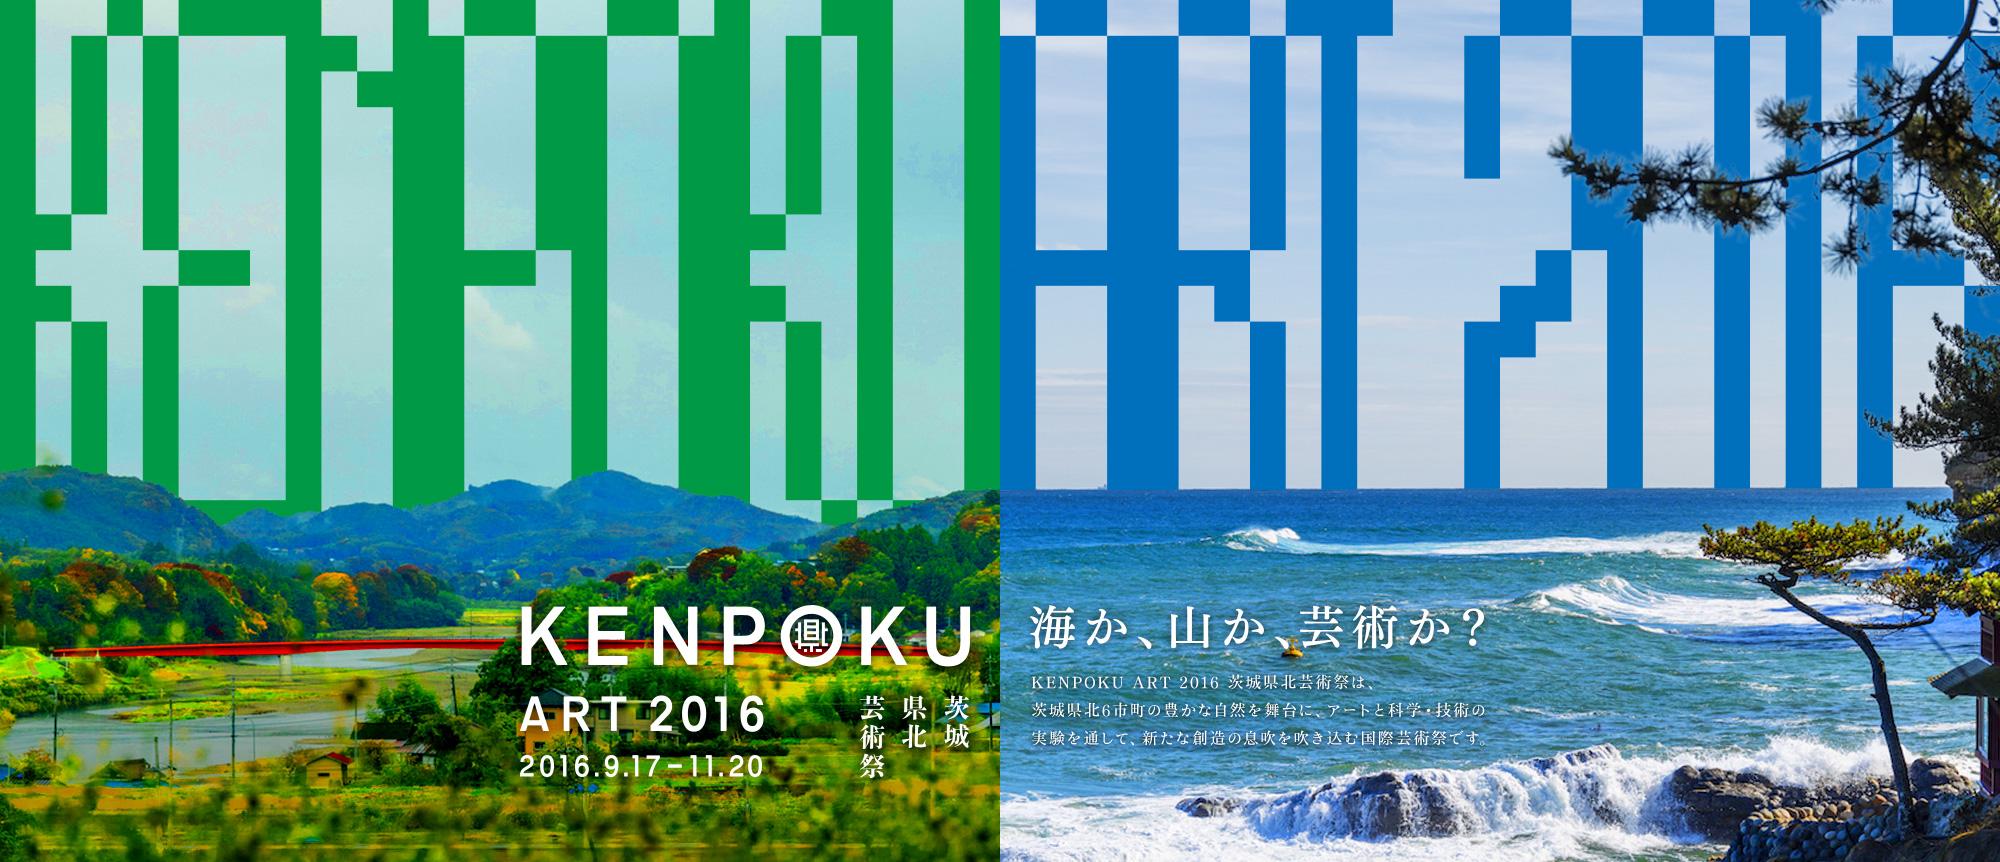 Exhibition: KENPOKU ART 2016 茨城県北芸術祭